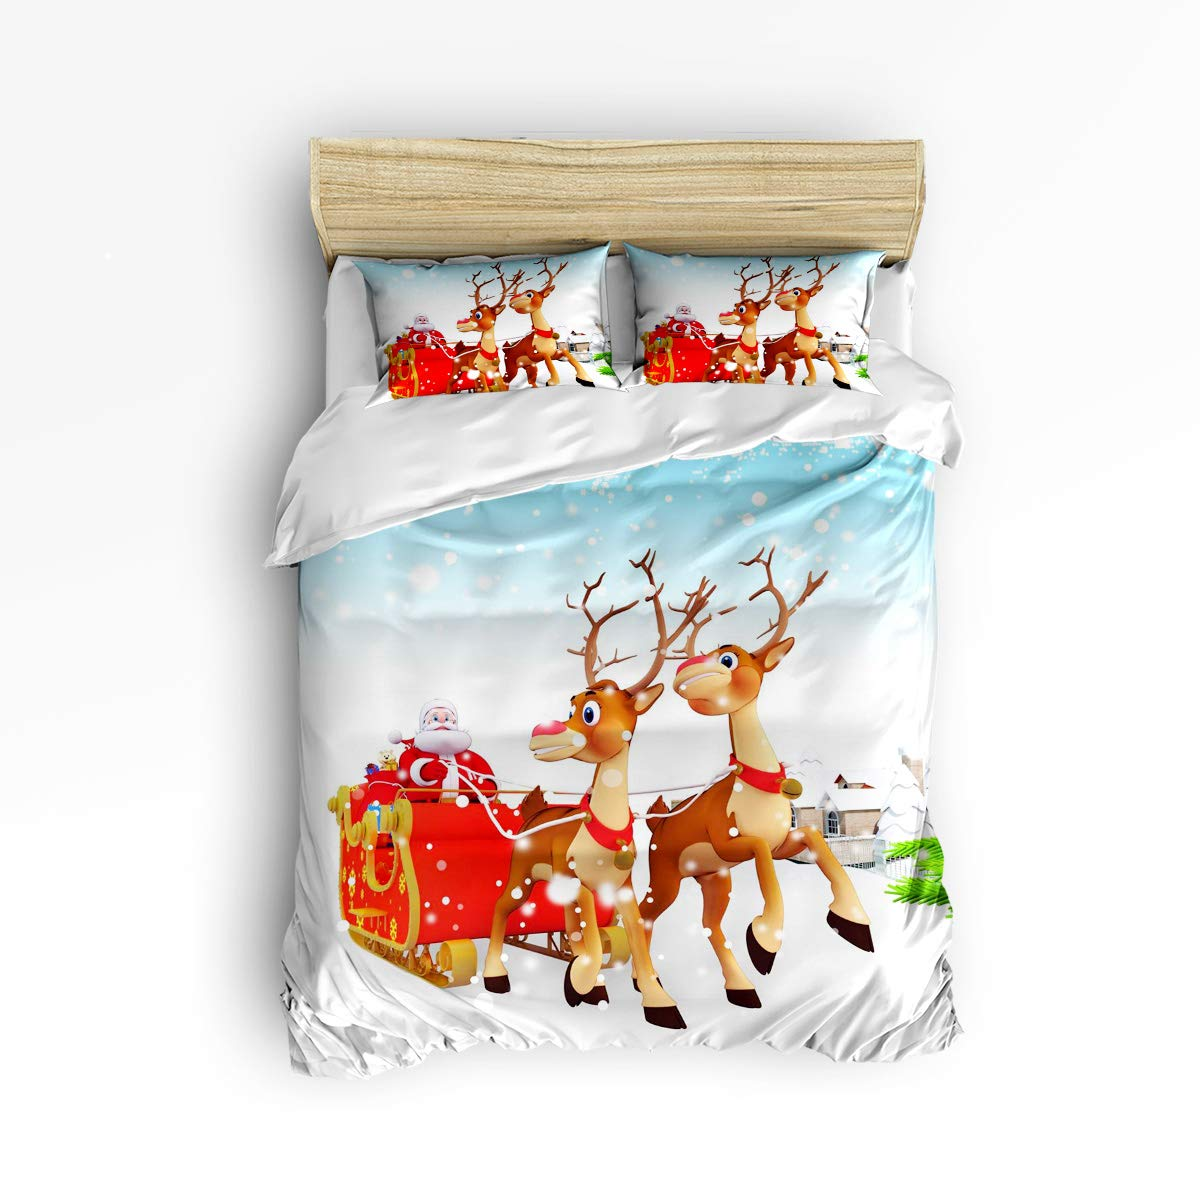 YEHO アートギャラリー ソフト布団カバー3点セット 掛け布団カバー1点 枕カバー2点付き 女の子 男の子 ハンドペイント 銀河と惑星 宇宙のクリスマス 寝具セット Queen Size 20181114SJSWHLWHLYASLXM01695SJSCYAG B07KJRCY4G Christmas773lyag2732 Queen Size